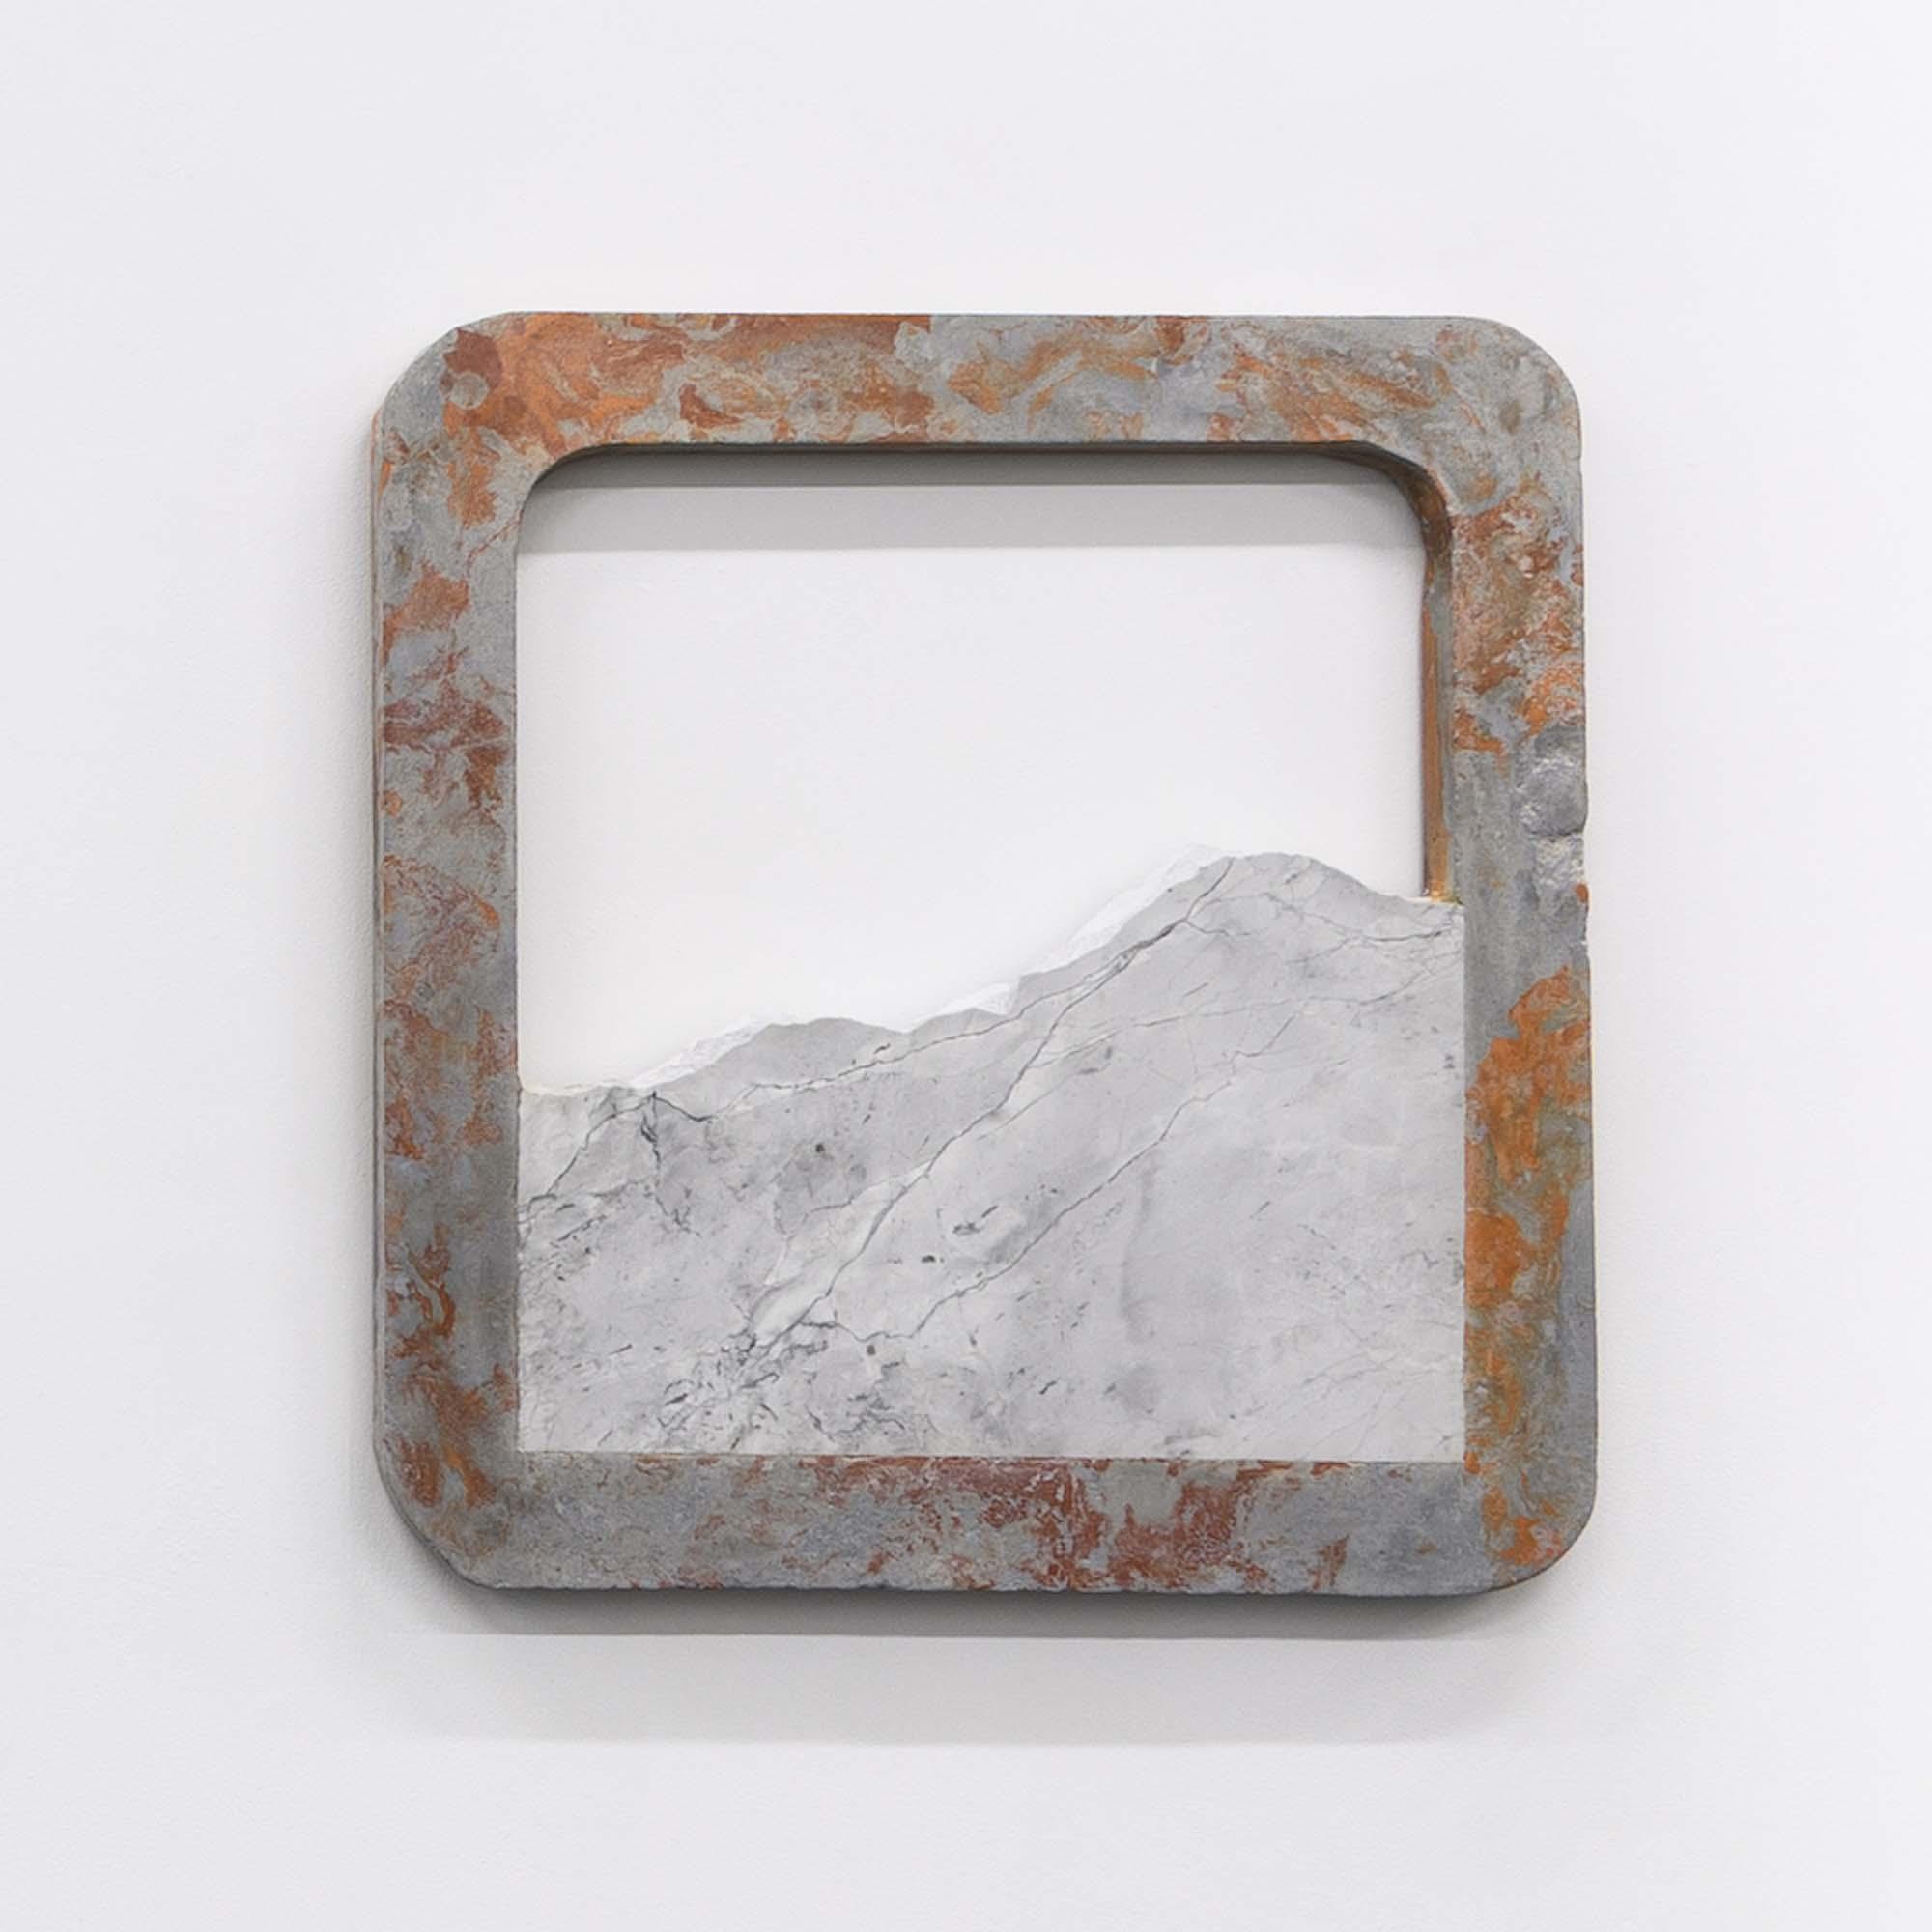 Rachel Mica Weiss, Bound Landscape III. 2018. Cast concrete, pigment, marble. 29